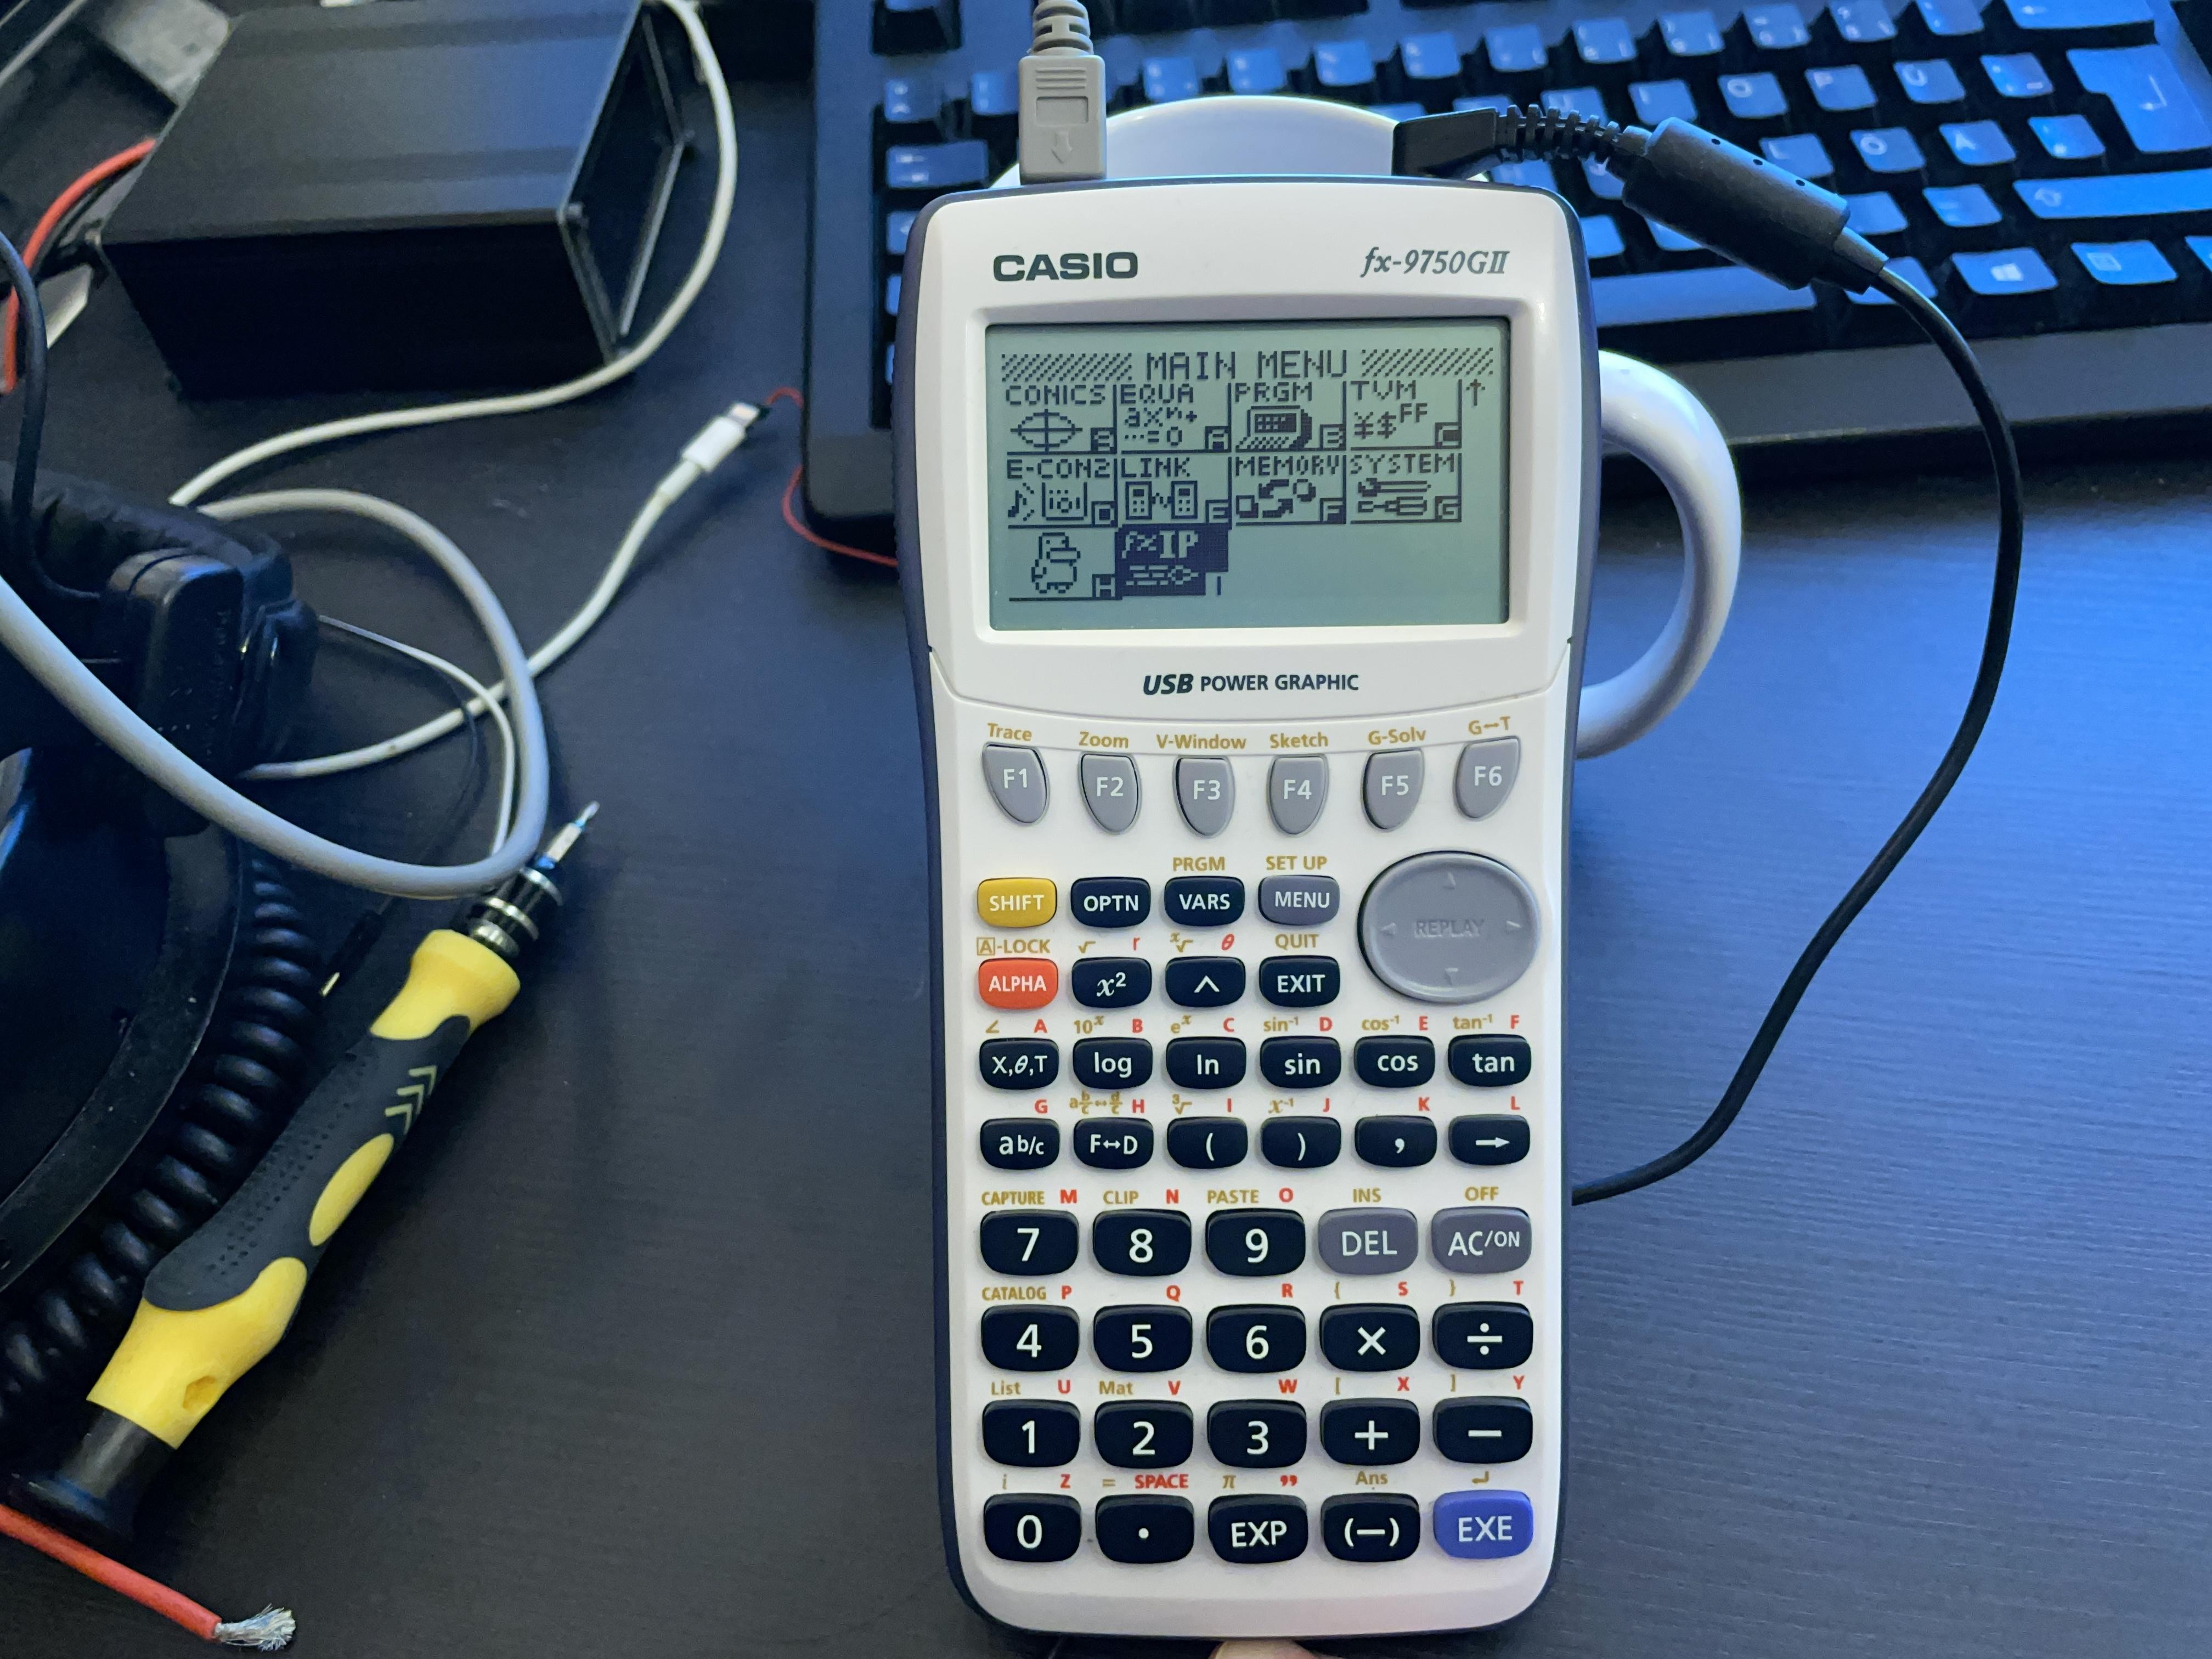 Casio fx-9750GII Webserver